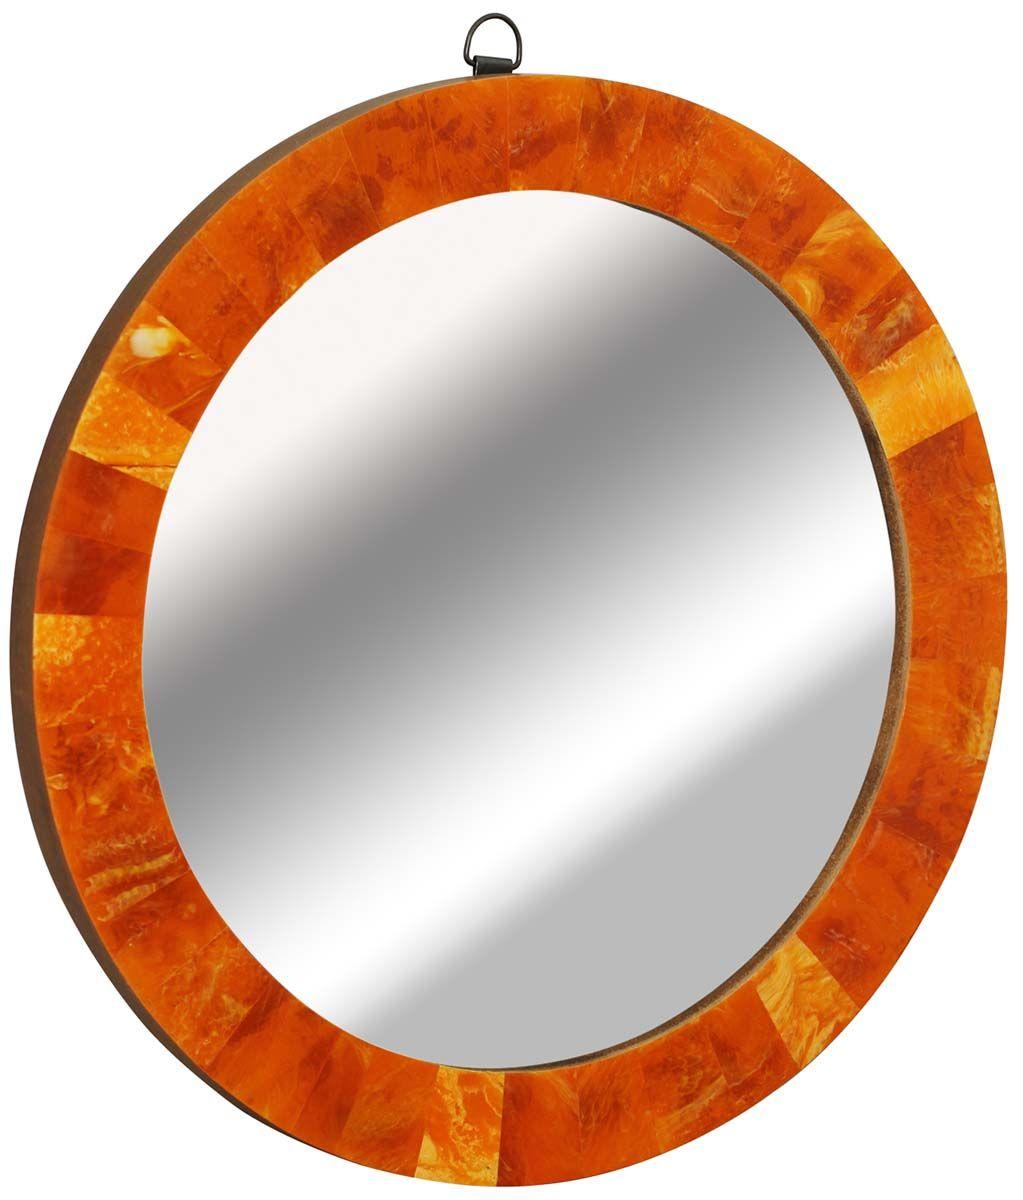 decorative on com decor art wall mirror shape buy round alibaba fan ven product detail